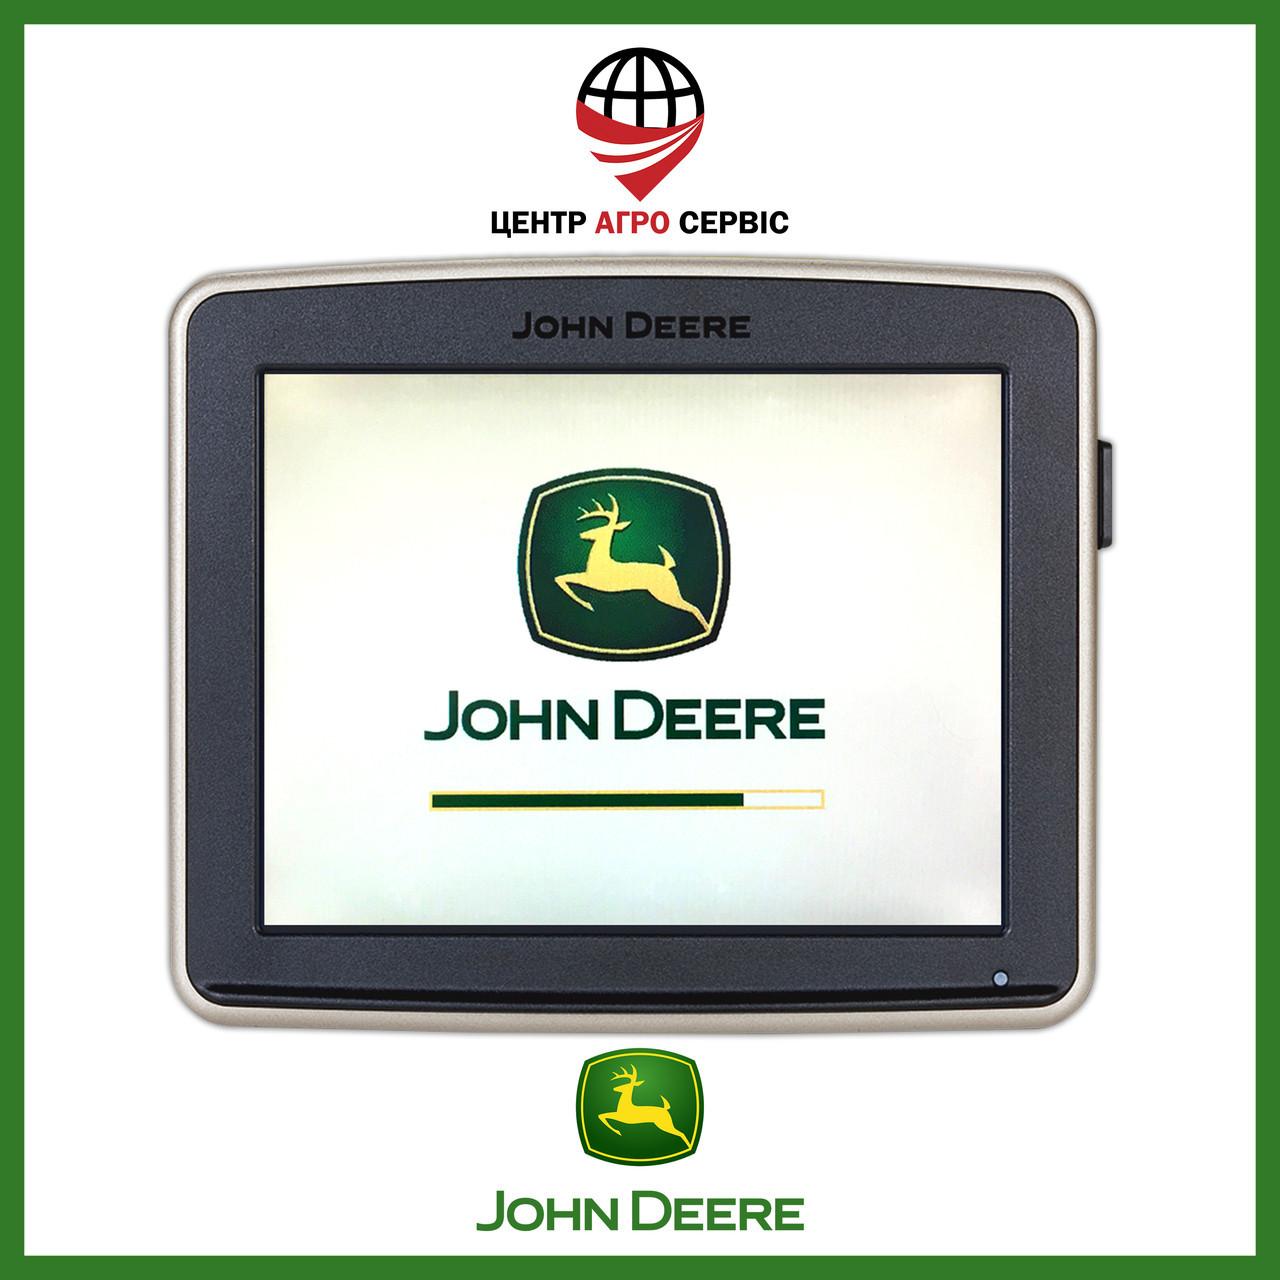 Gps навигатор для трактора (навигатор для поля, сельхоз навигатор)  Джон дир 2630